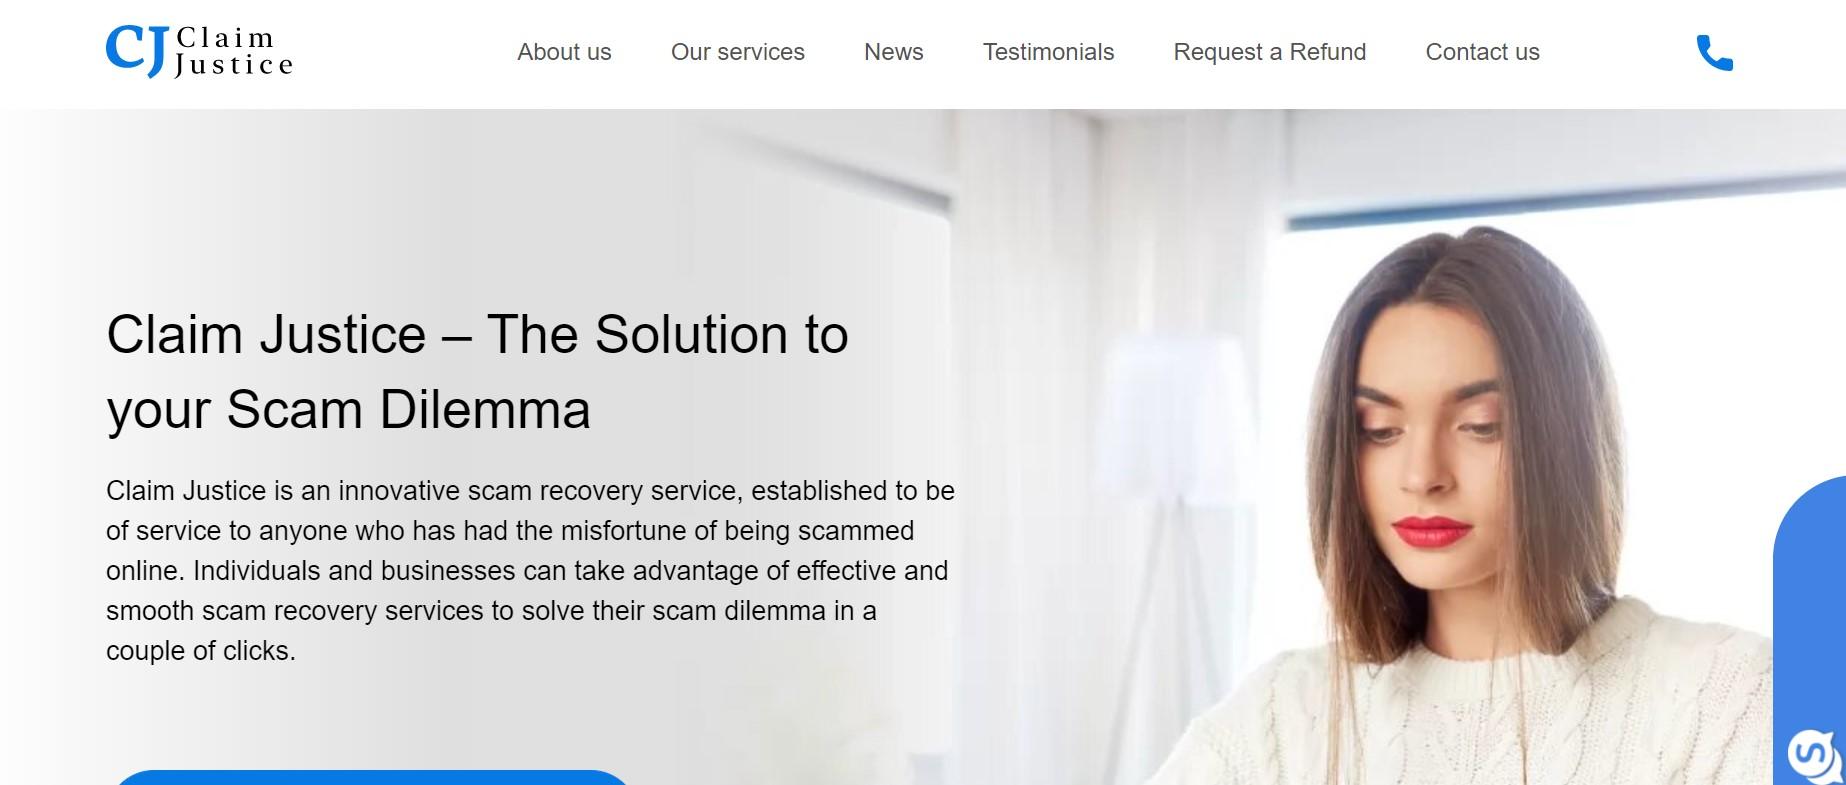 Claim Justice website